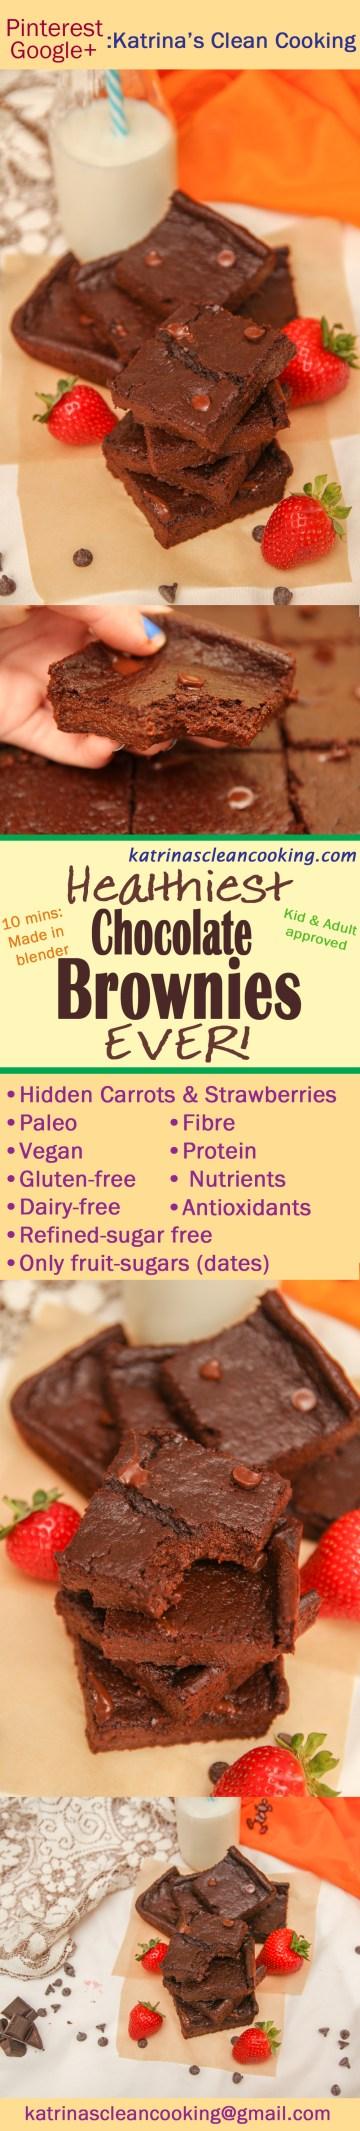 Healthy Chocolate Brownies #Healthy #Recipes #KatrinasCleanCooking